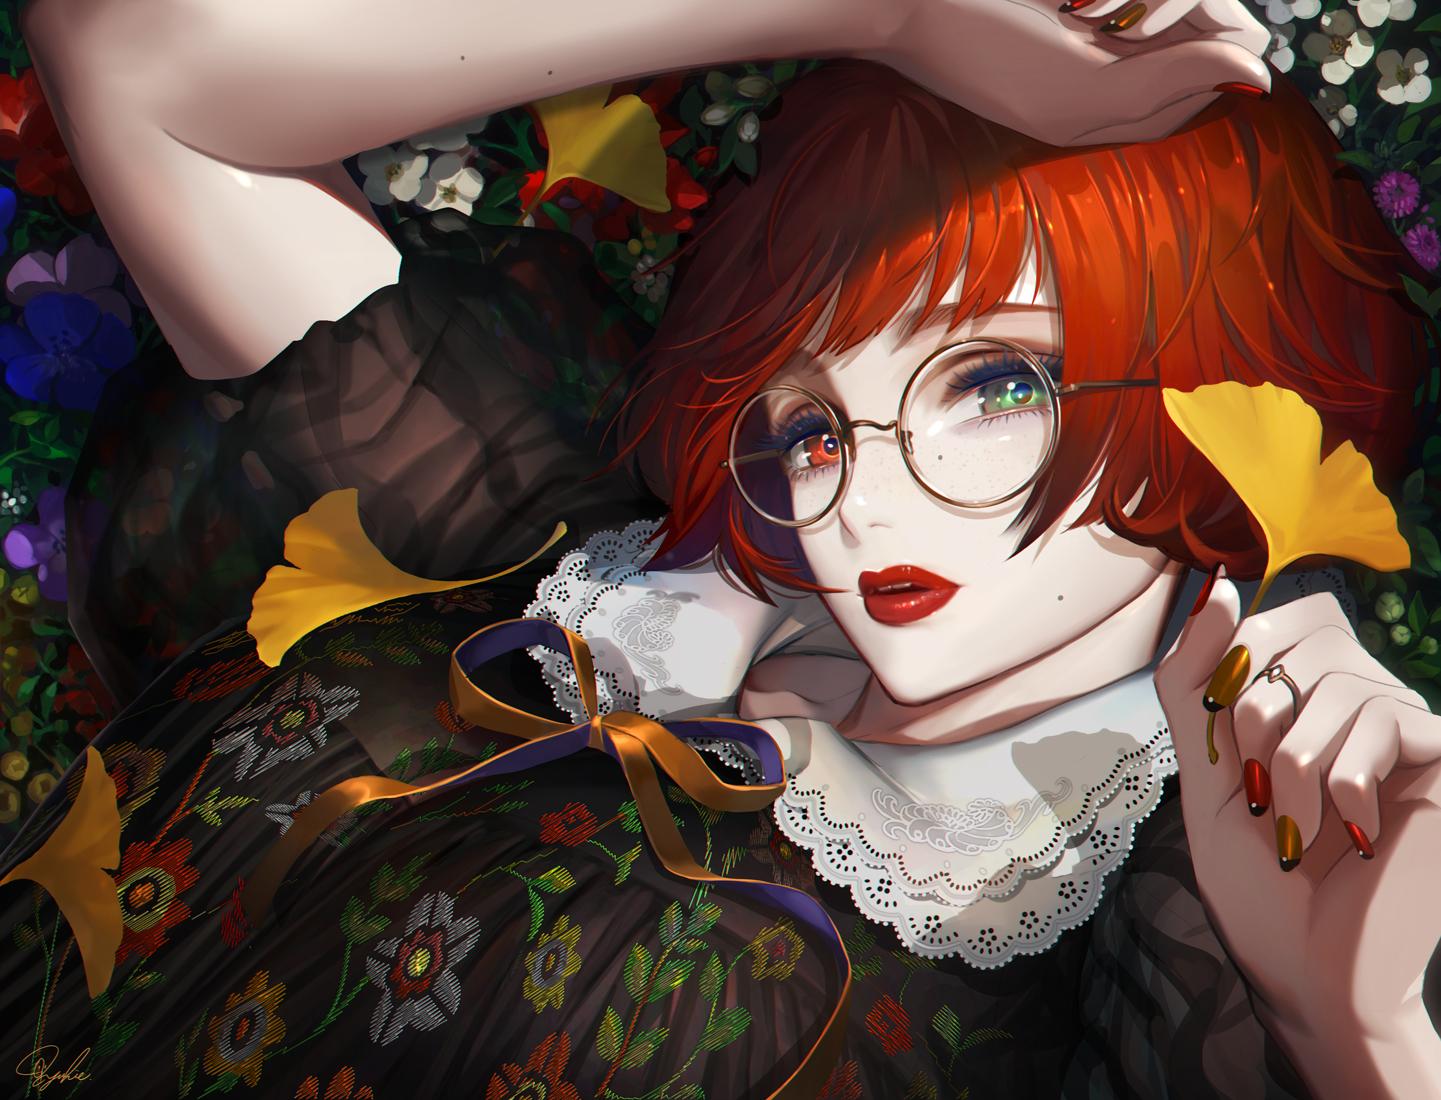 bicolored_eyes close flowers glasses leaves original red_hair see_through short_hair signed tajima_yukie